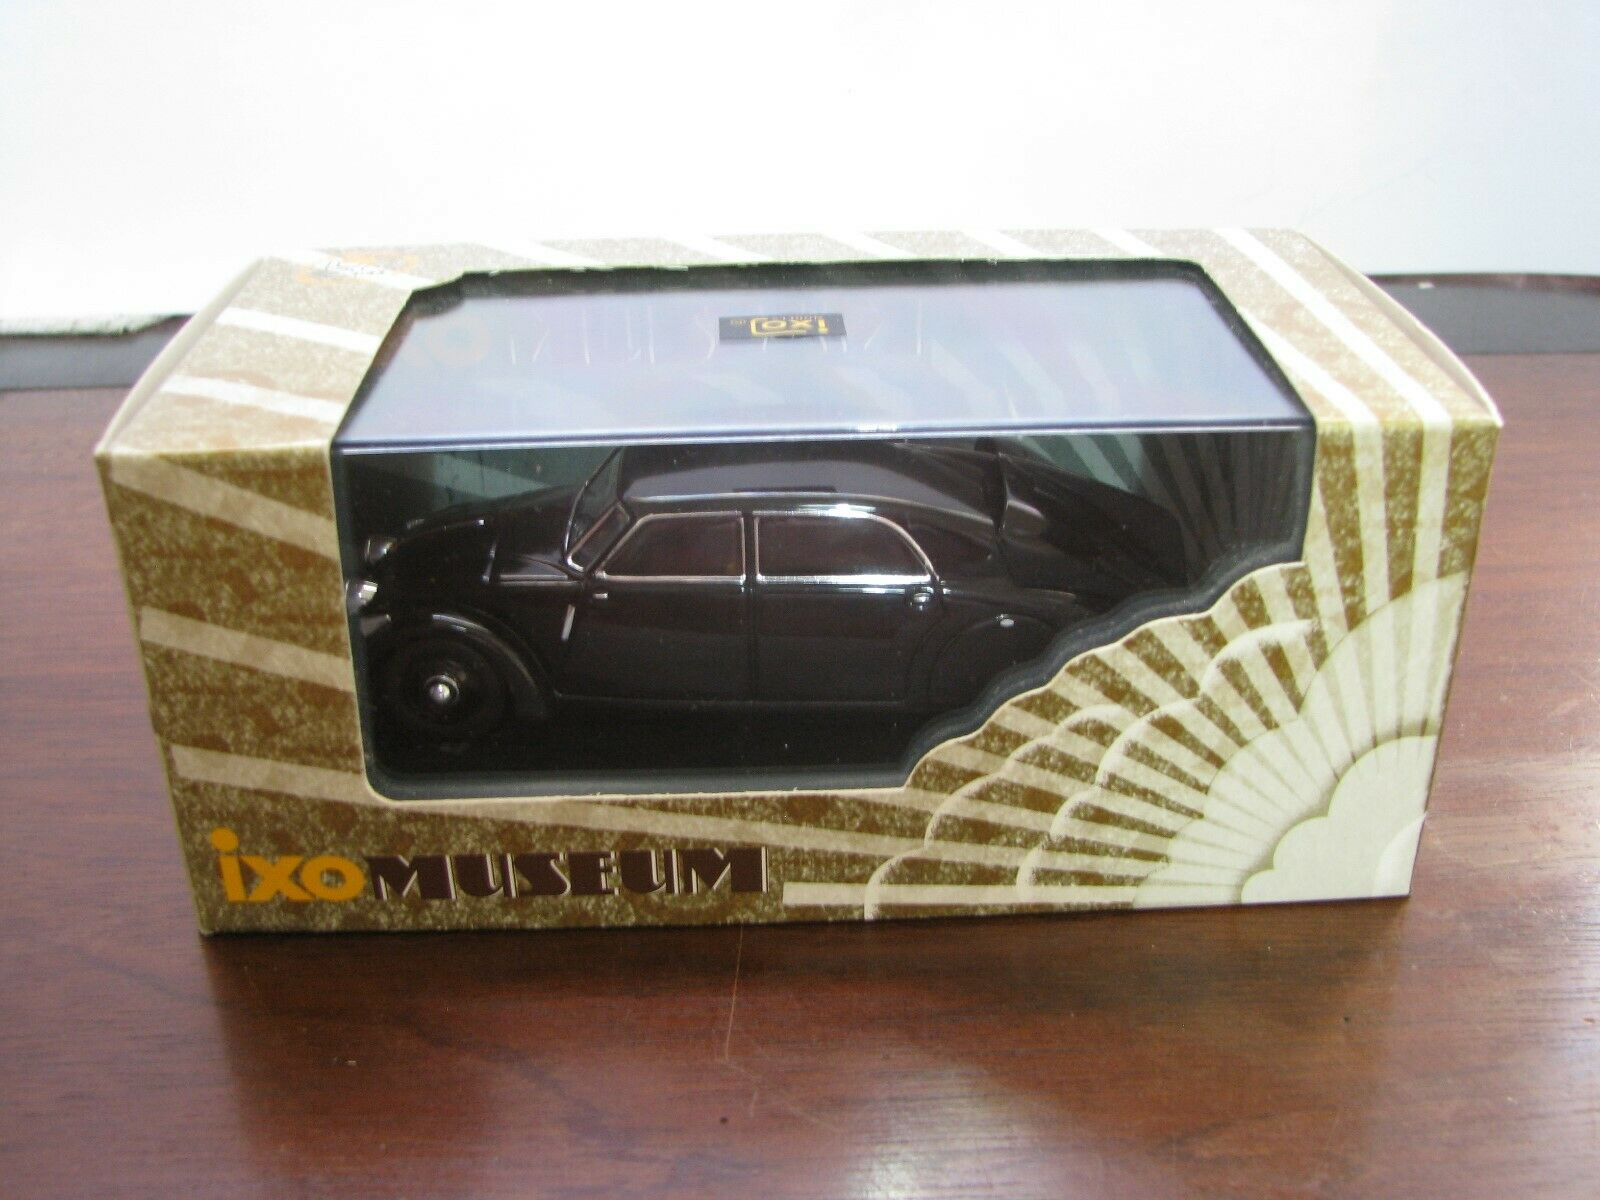 1 43 diecast cars IXO Museum Tatra 77 77 77 8aa2ac